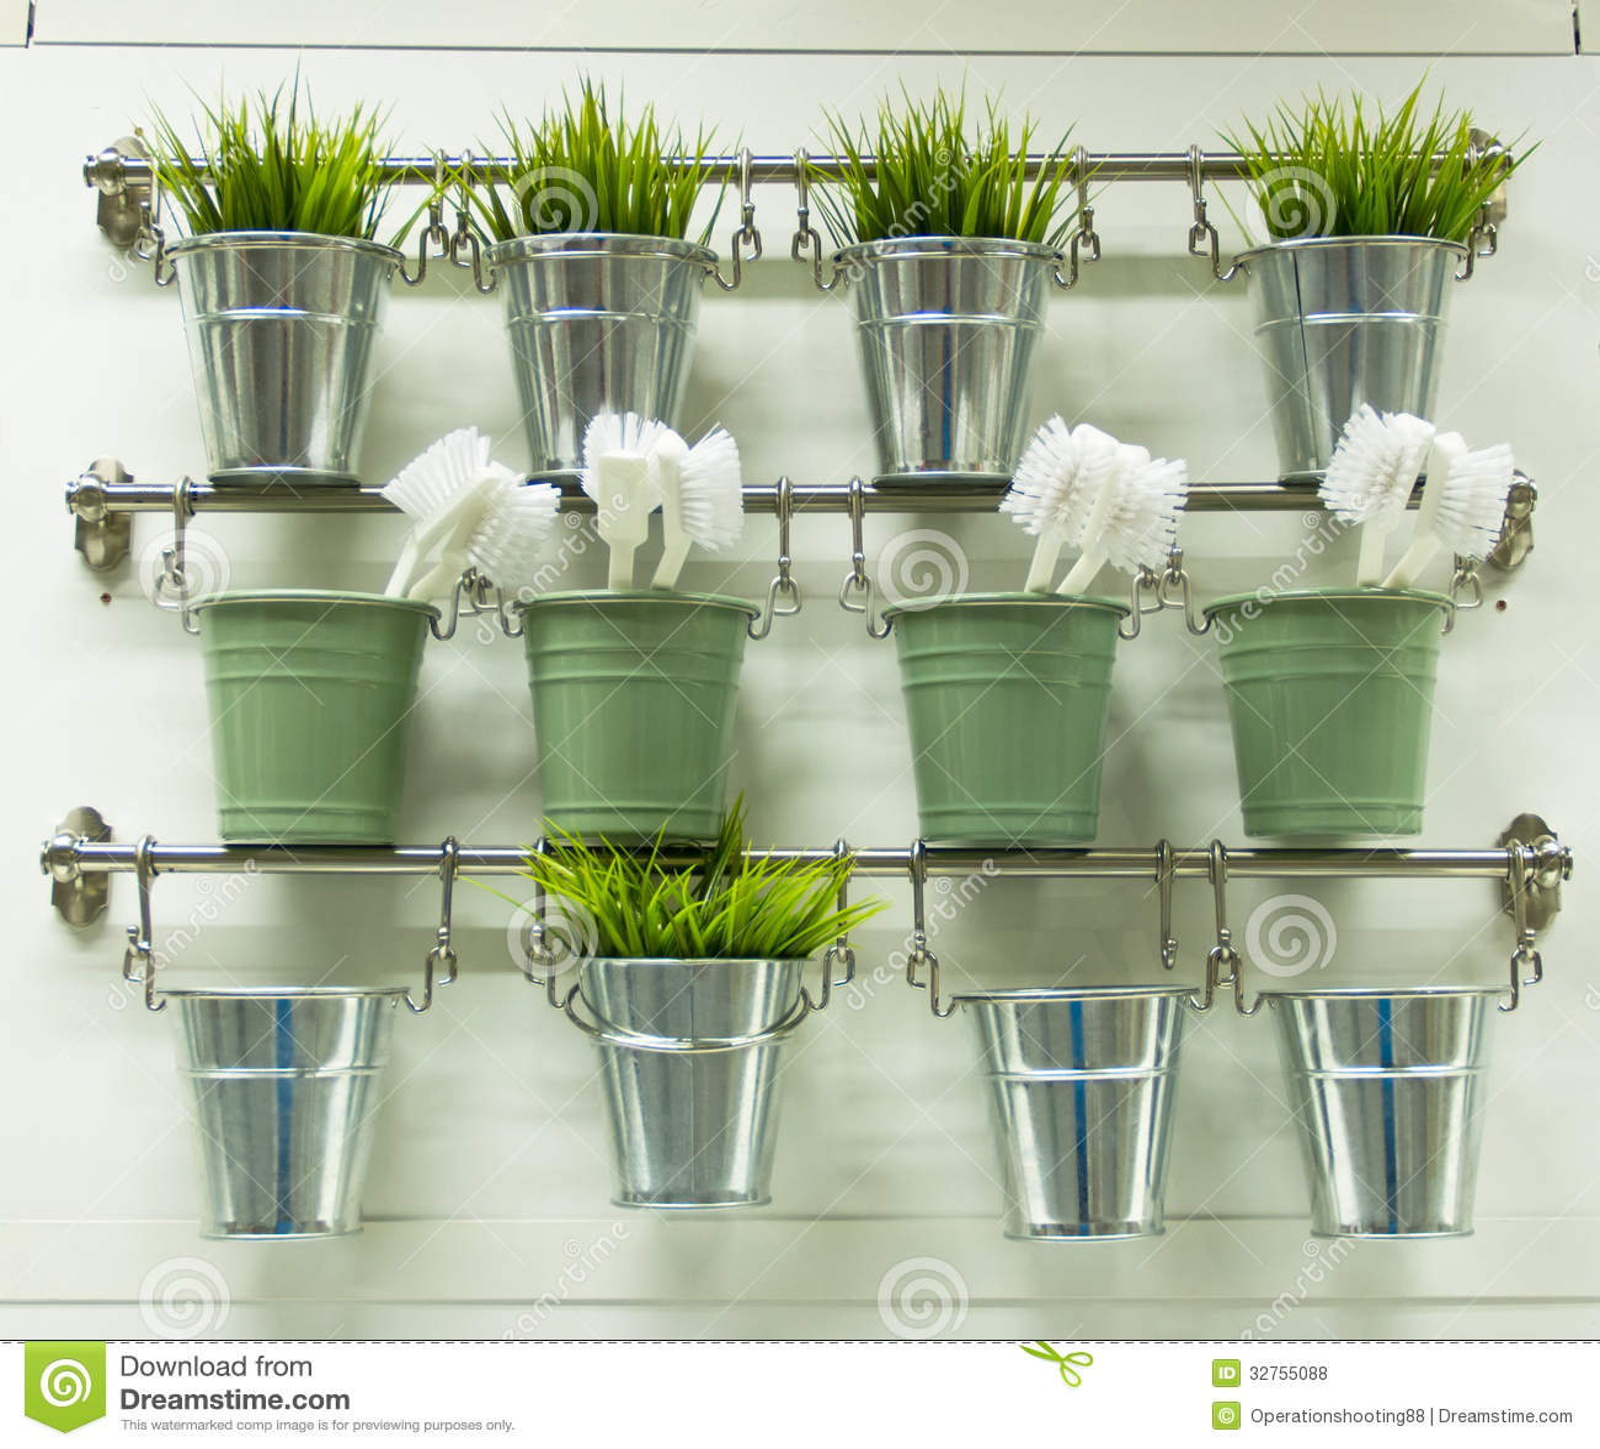 Asombroso estantes para plantas motivo ideas de for Estanteria jardin plantas